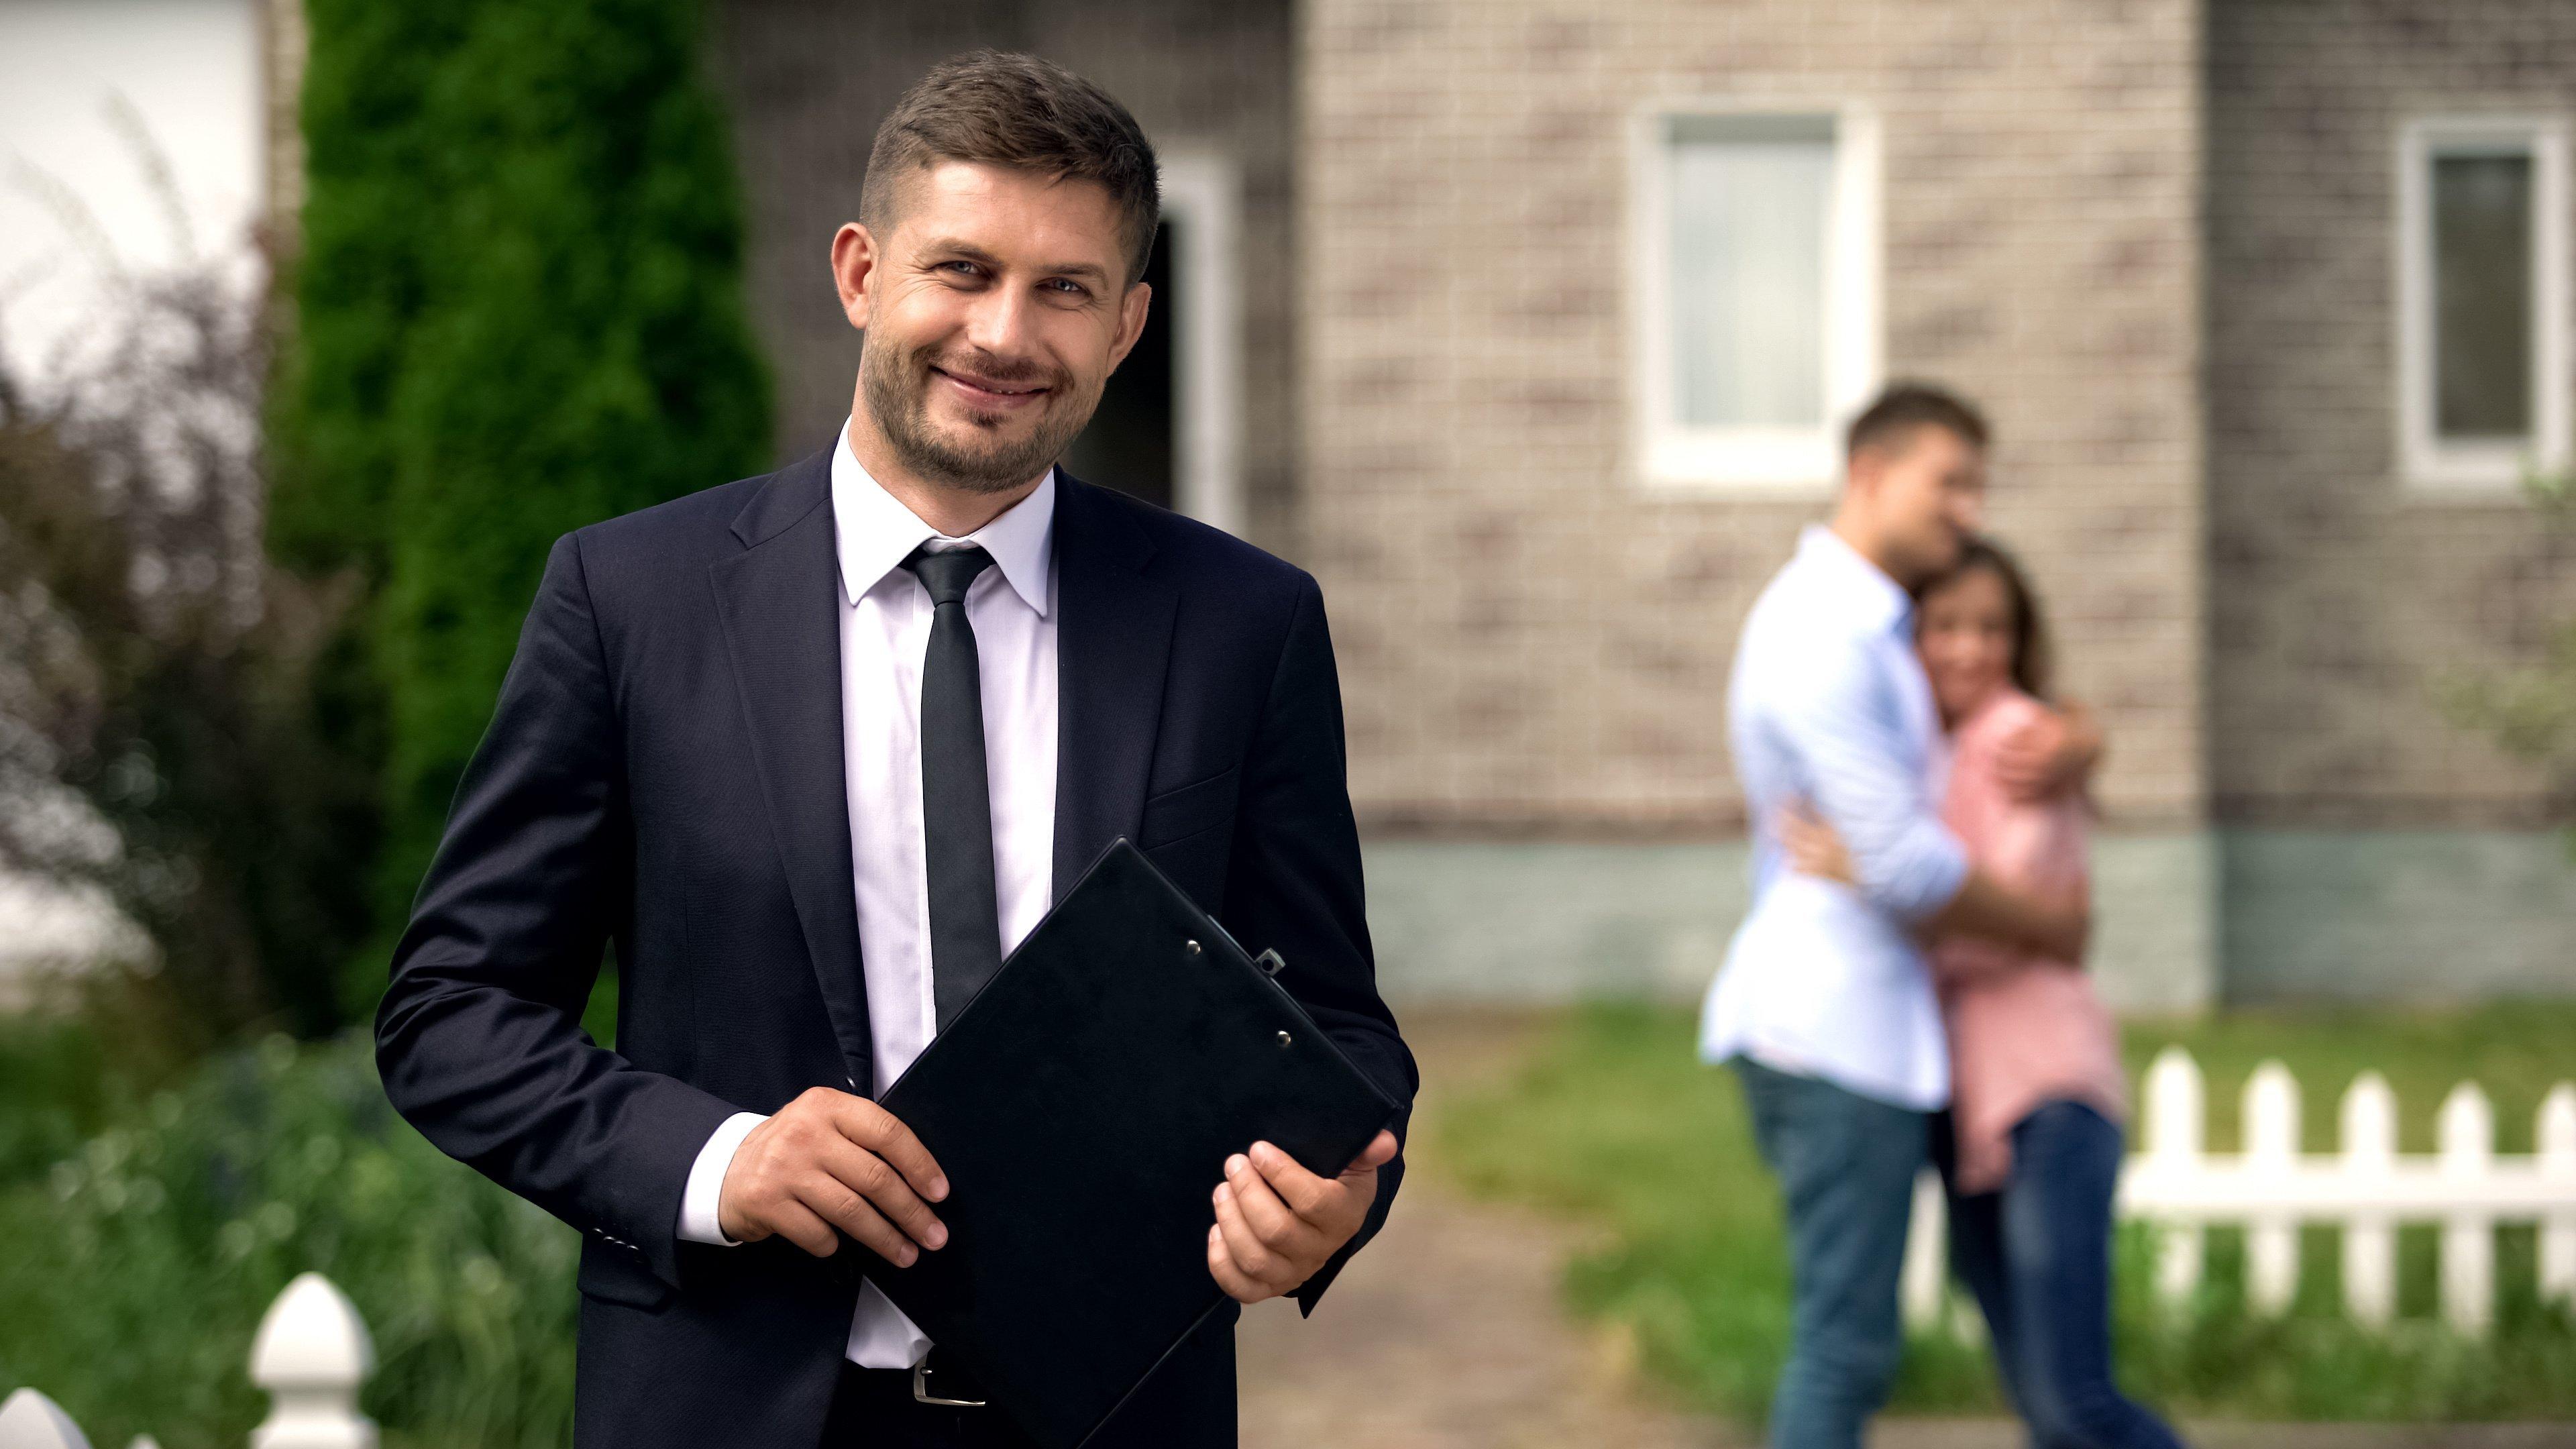 Texas Real Estate agent renewed